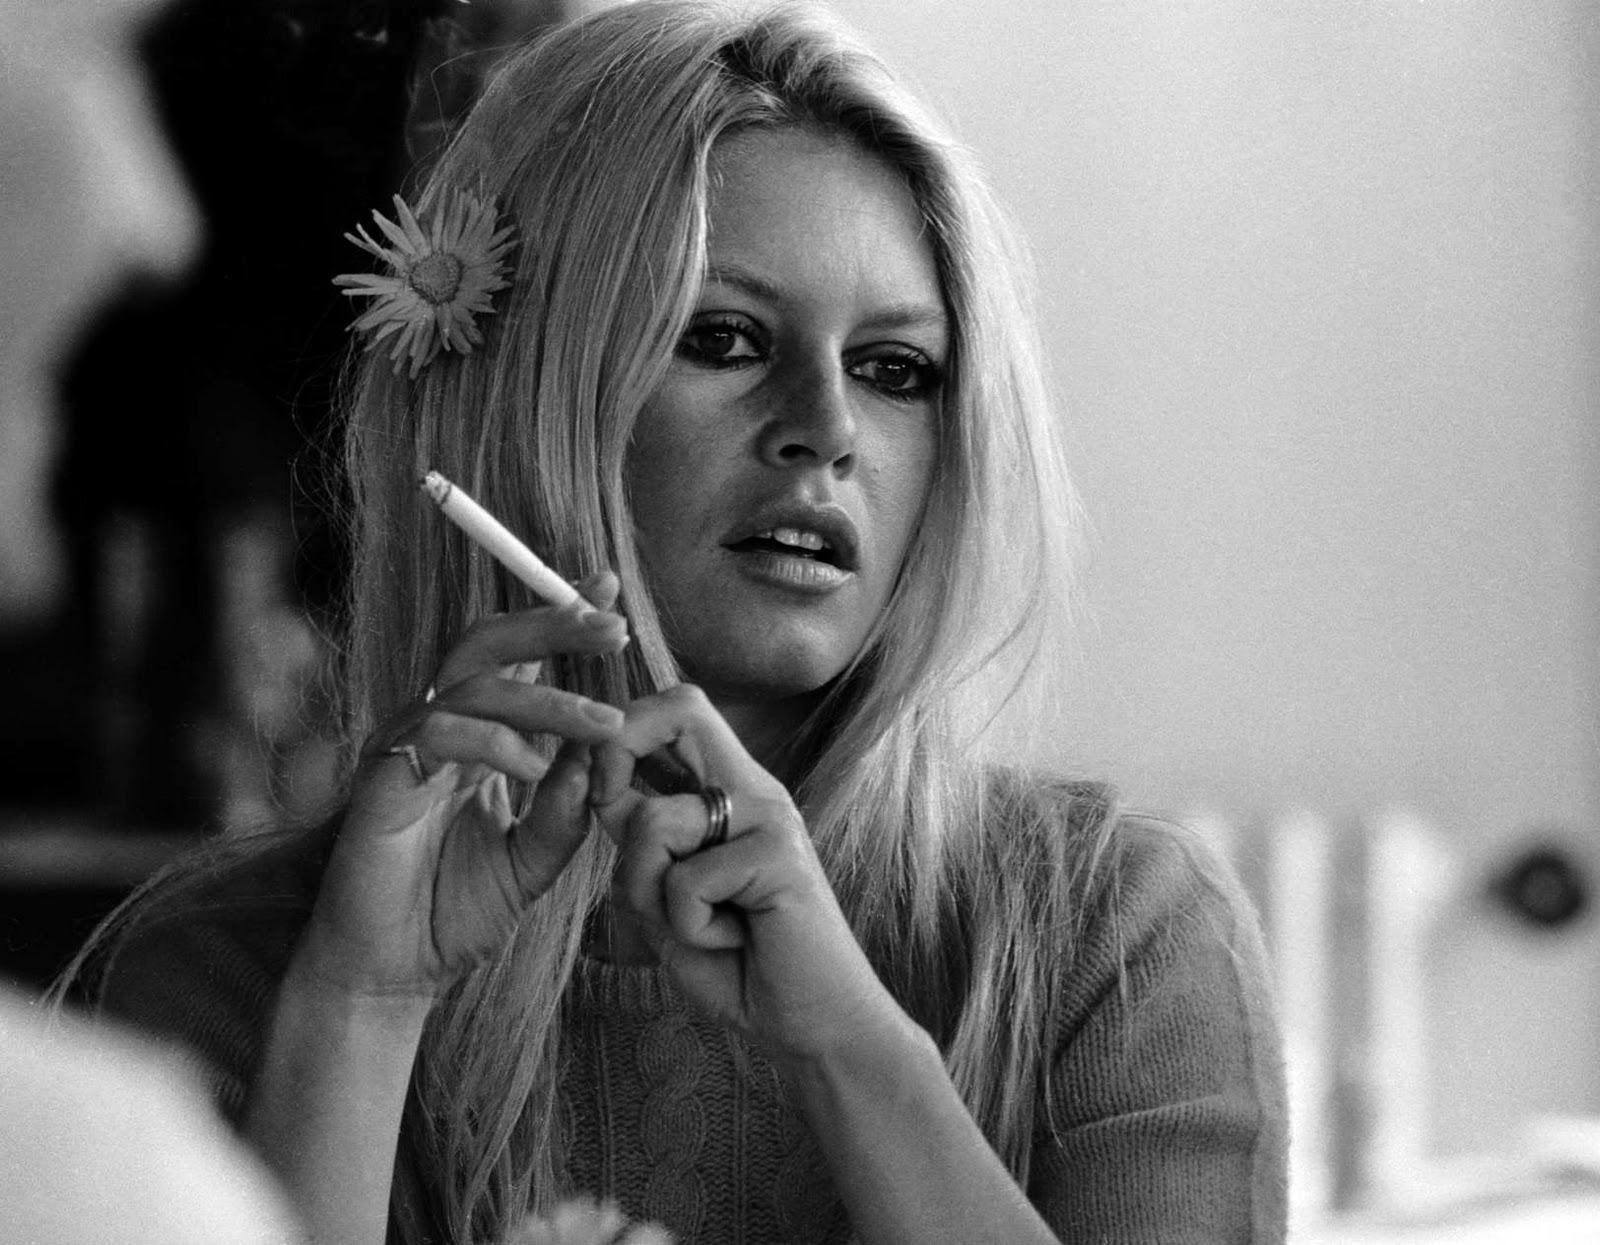 http://3.bp.blogspot.com/-oPfZrmKKi04/Tt05jLyVmQI/AAAAAAAAAz8/CW1BwgRDf9Y/s1600/Brigitte-Bardot-2.jpg